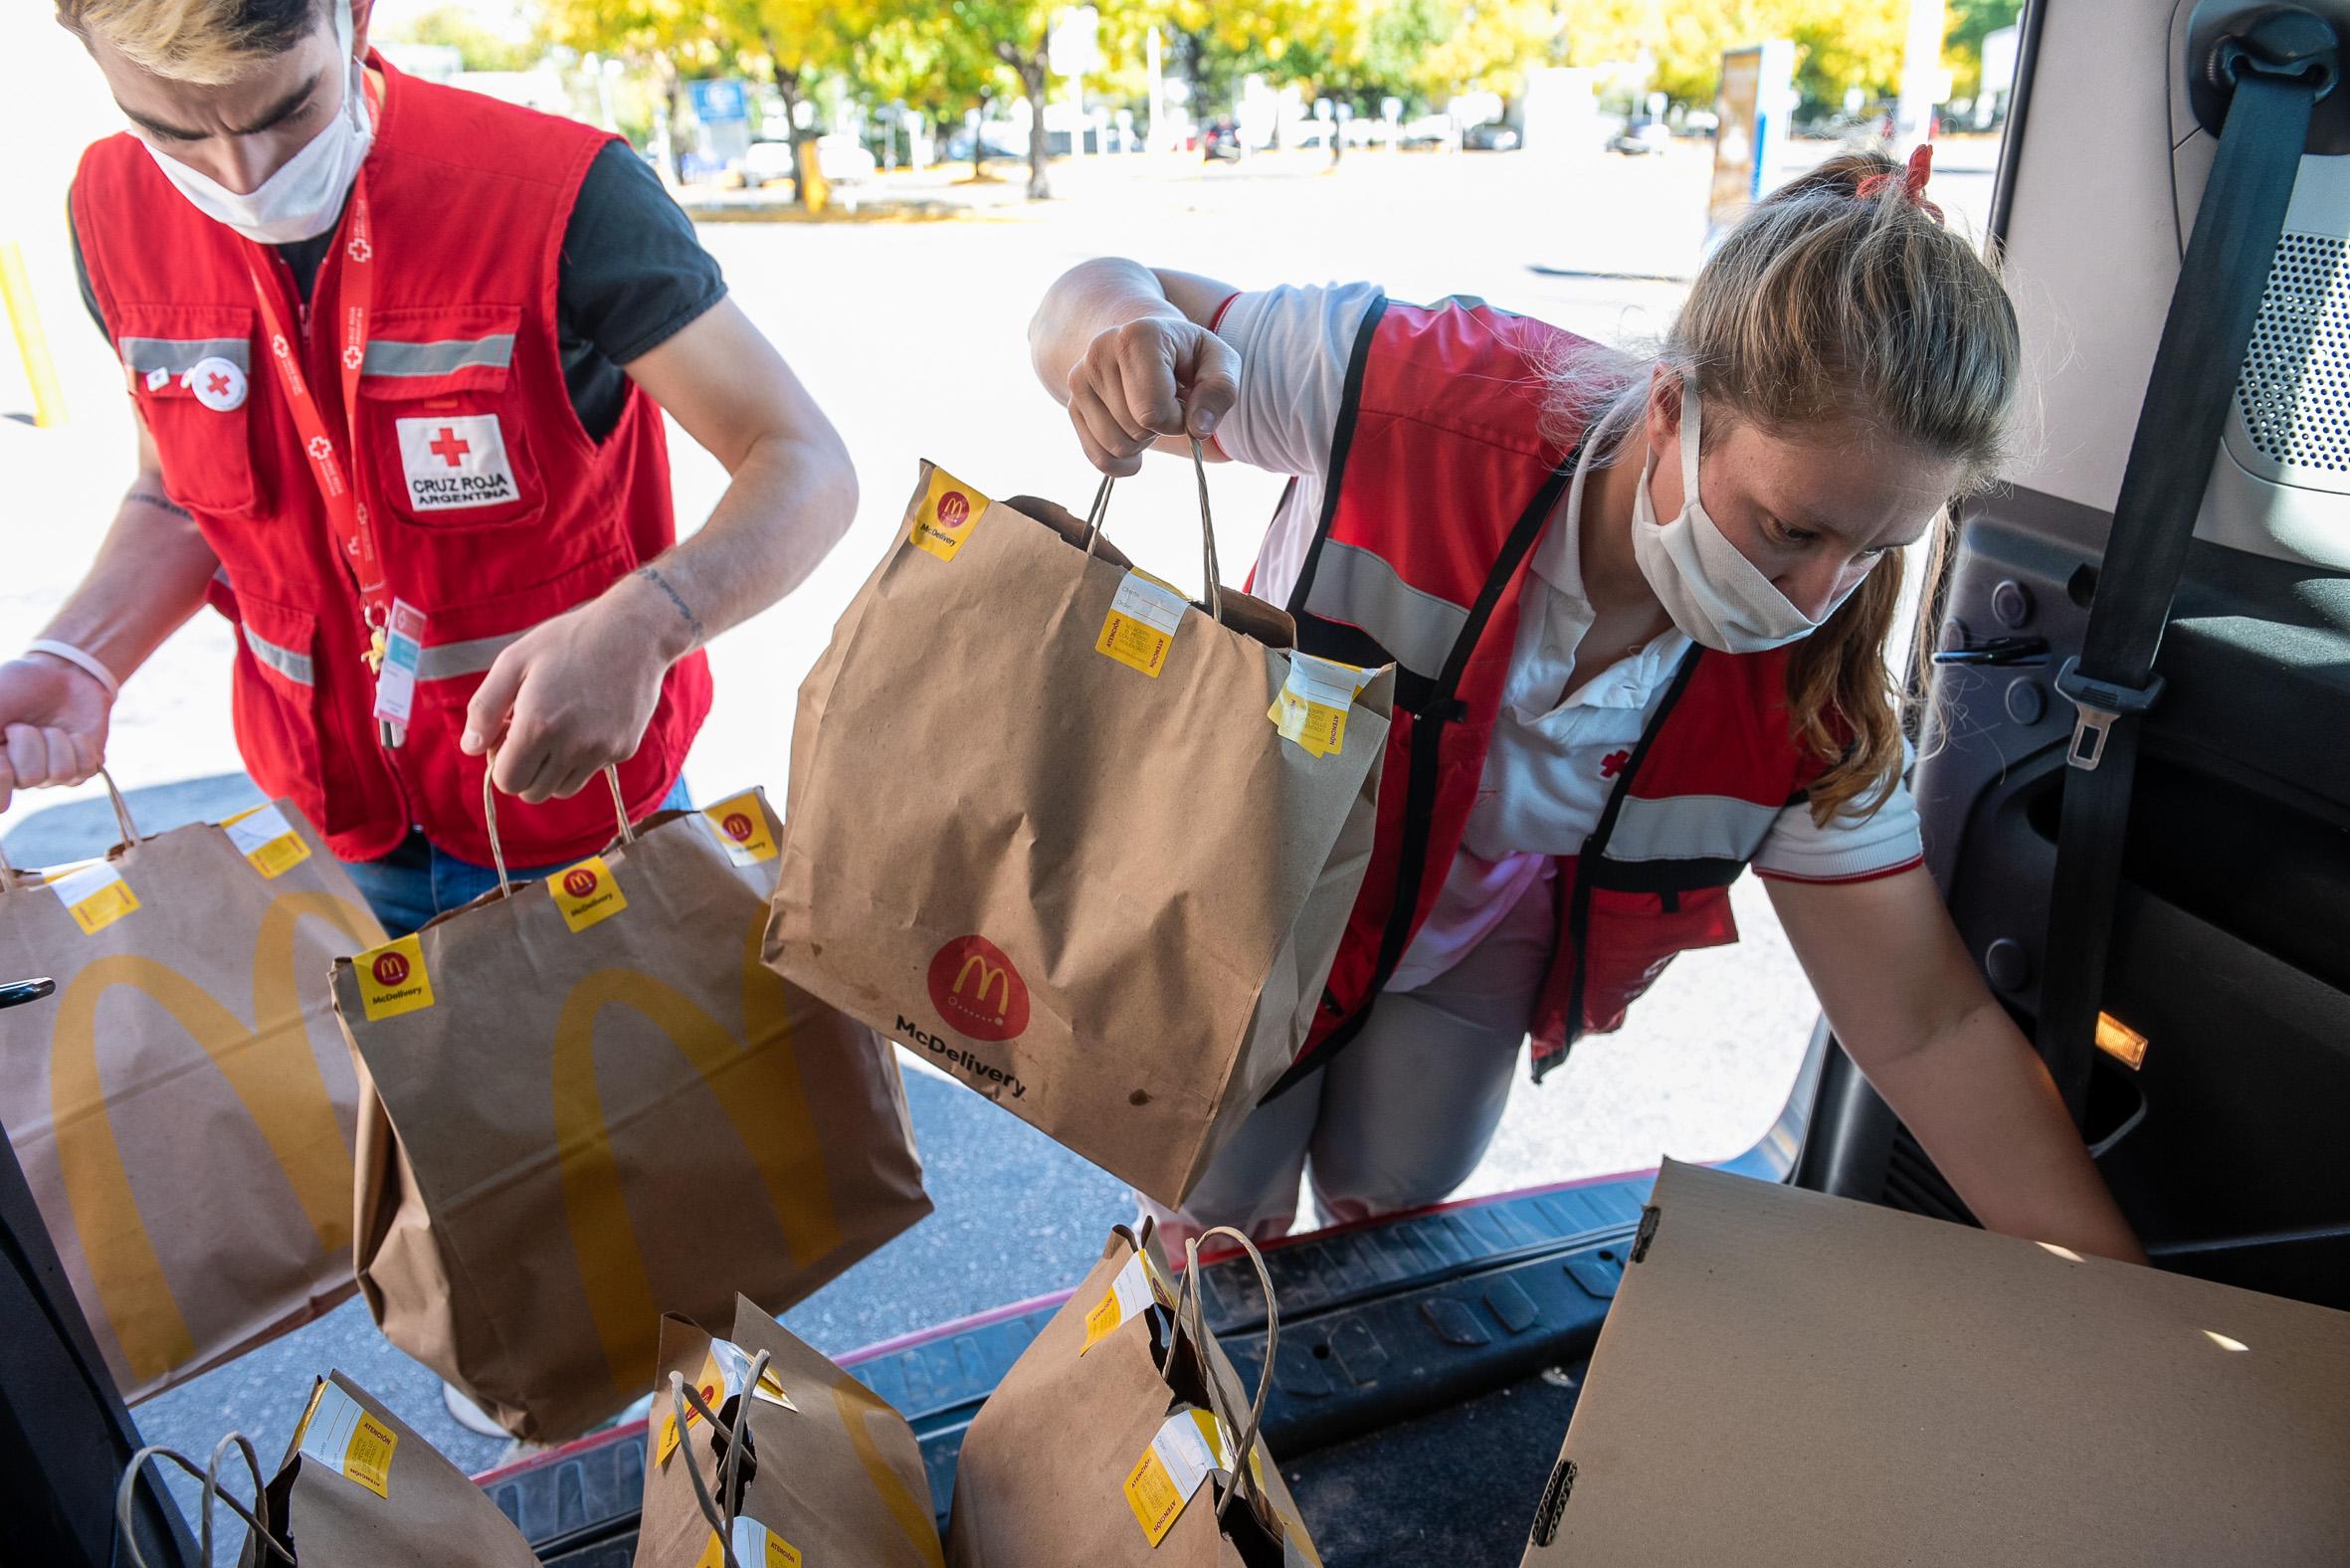 McDonald's dona alrededor de 70 mil platos de comida para colaborar con comedores de Buenos Aires